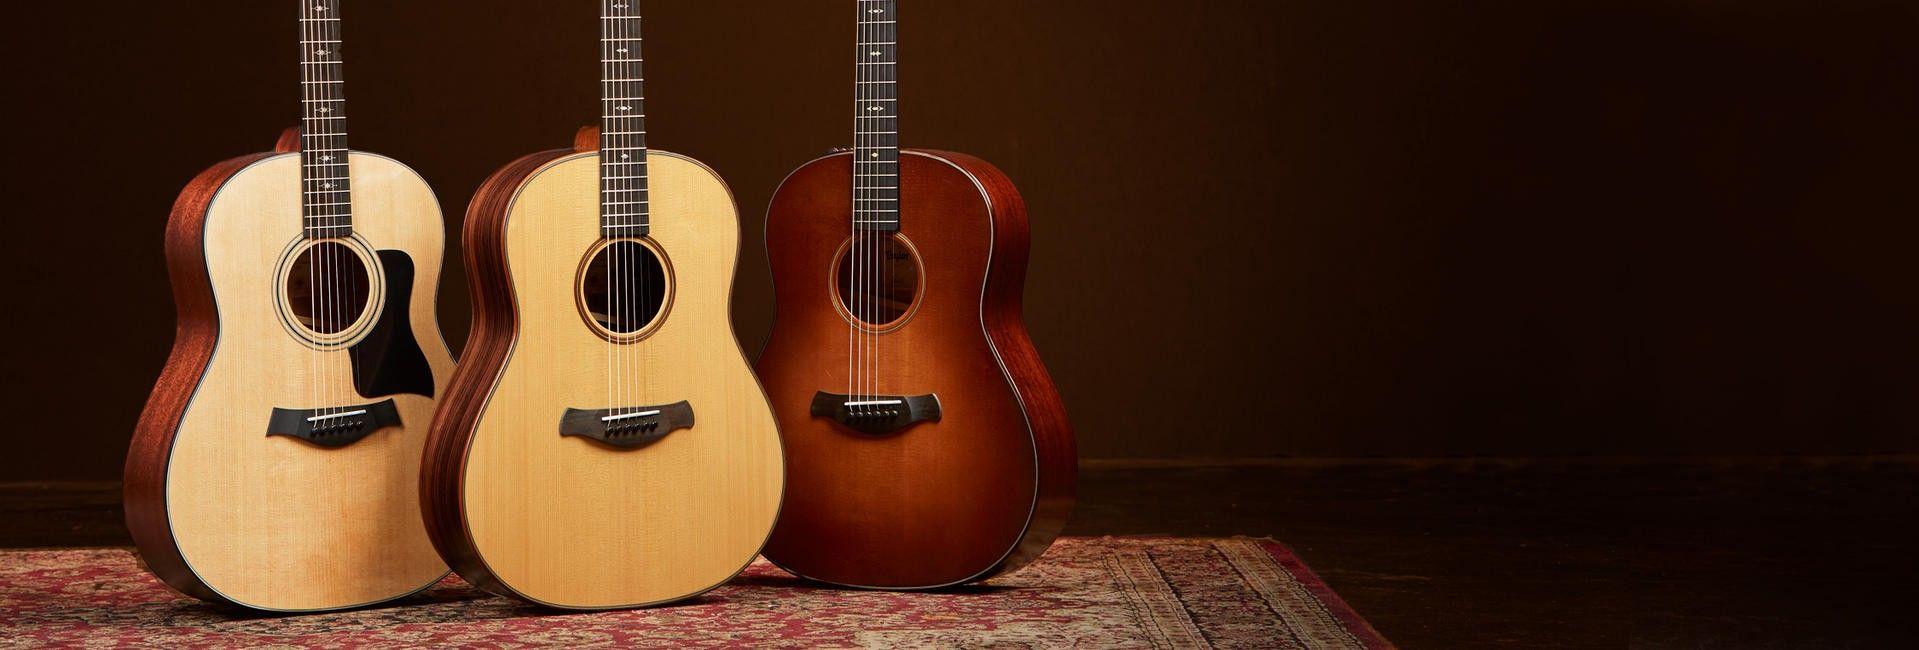 Pin By Jenny Hinzman On Mobile Photobucket Yamaha Acoustic Guitar Guitar Yamaha Guitar